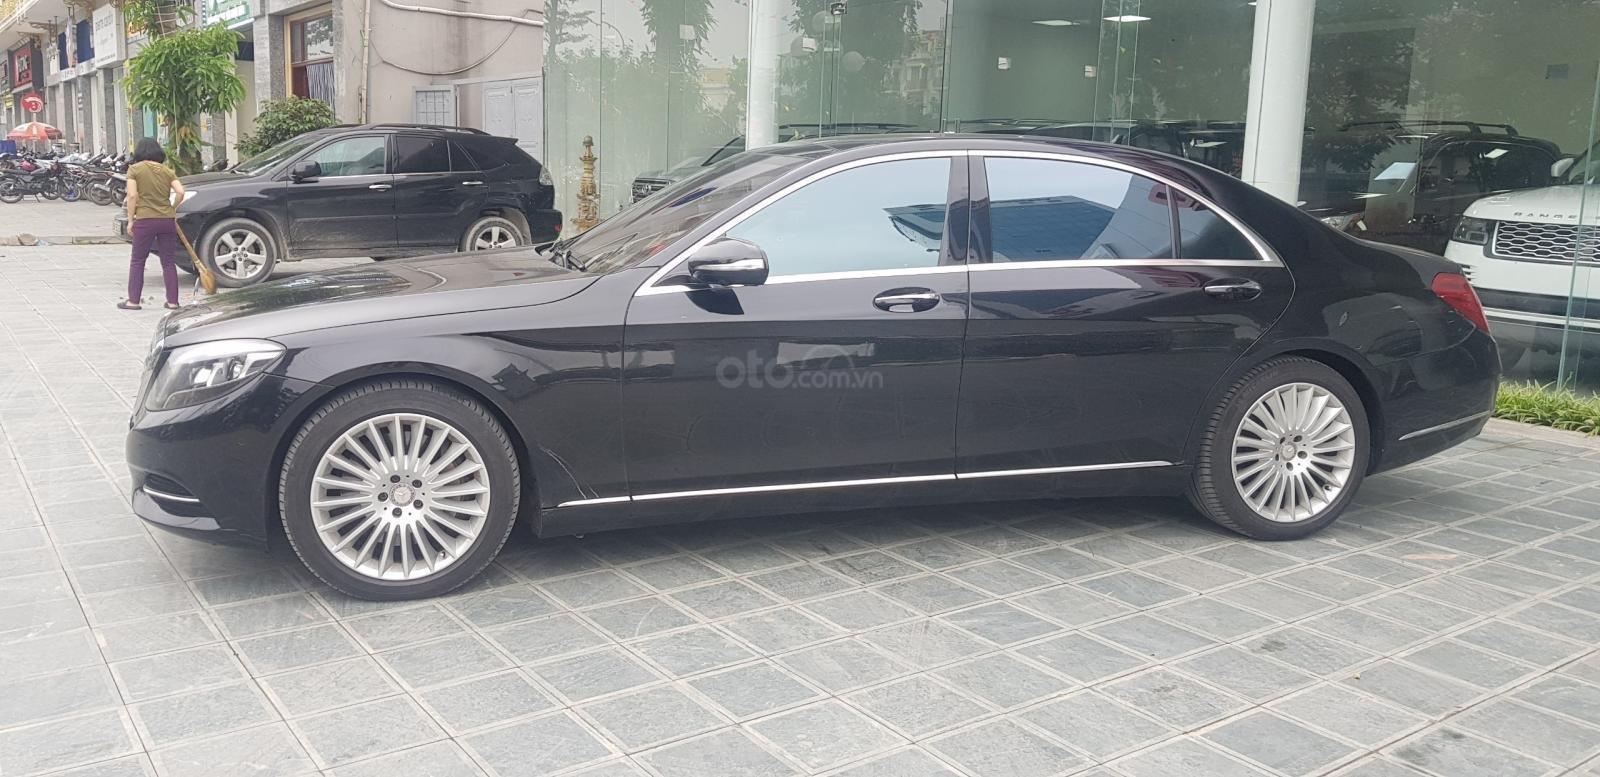 Bán Mercedes-Benz S500 SX 2016 màu đen, LH Ms  Hương 094.539.2468 (17)